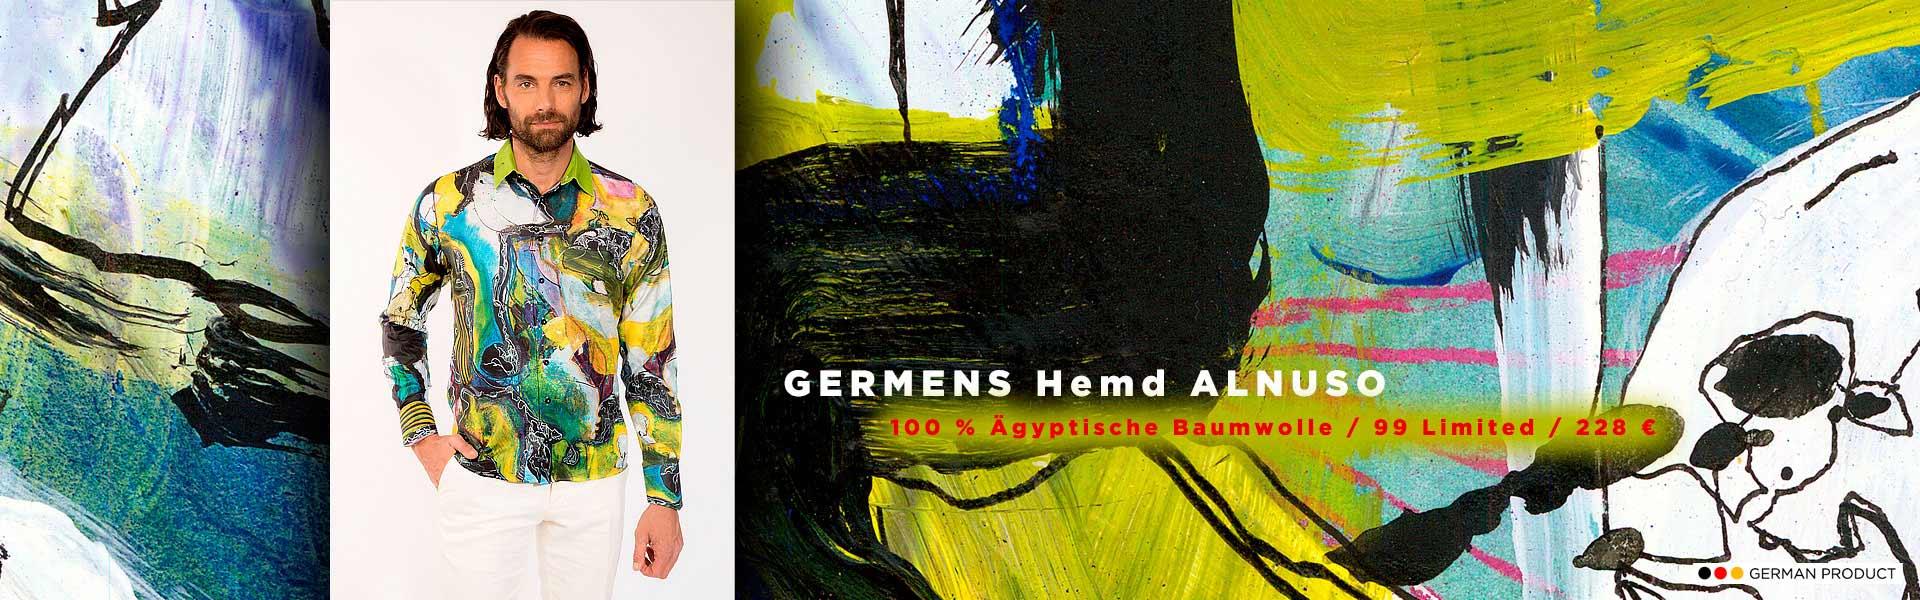 GERMENS Hemd